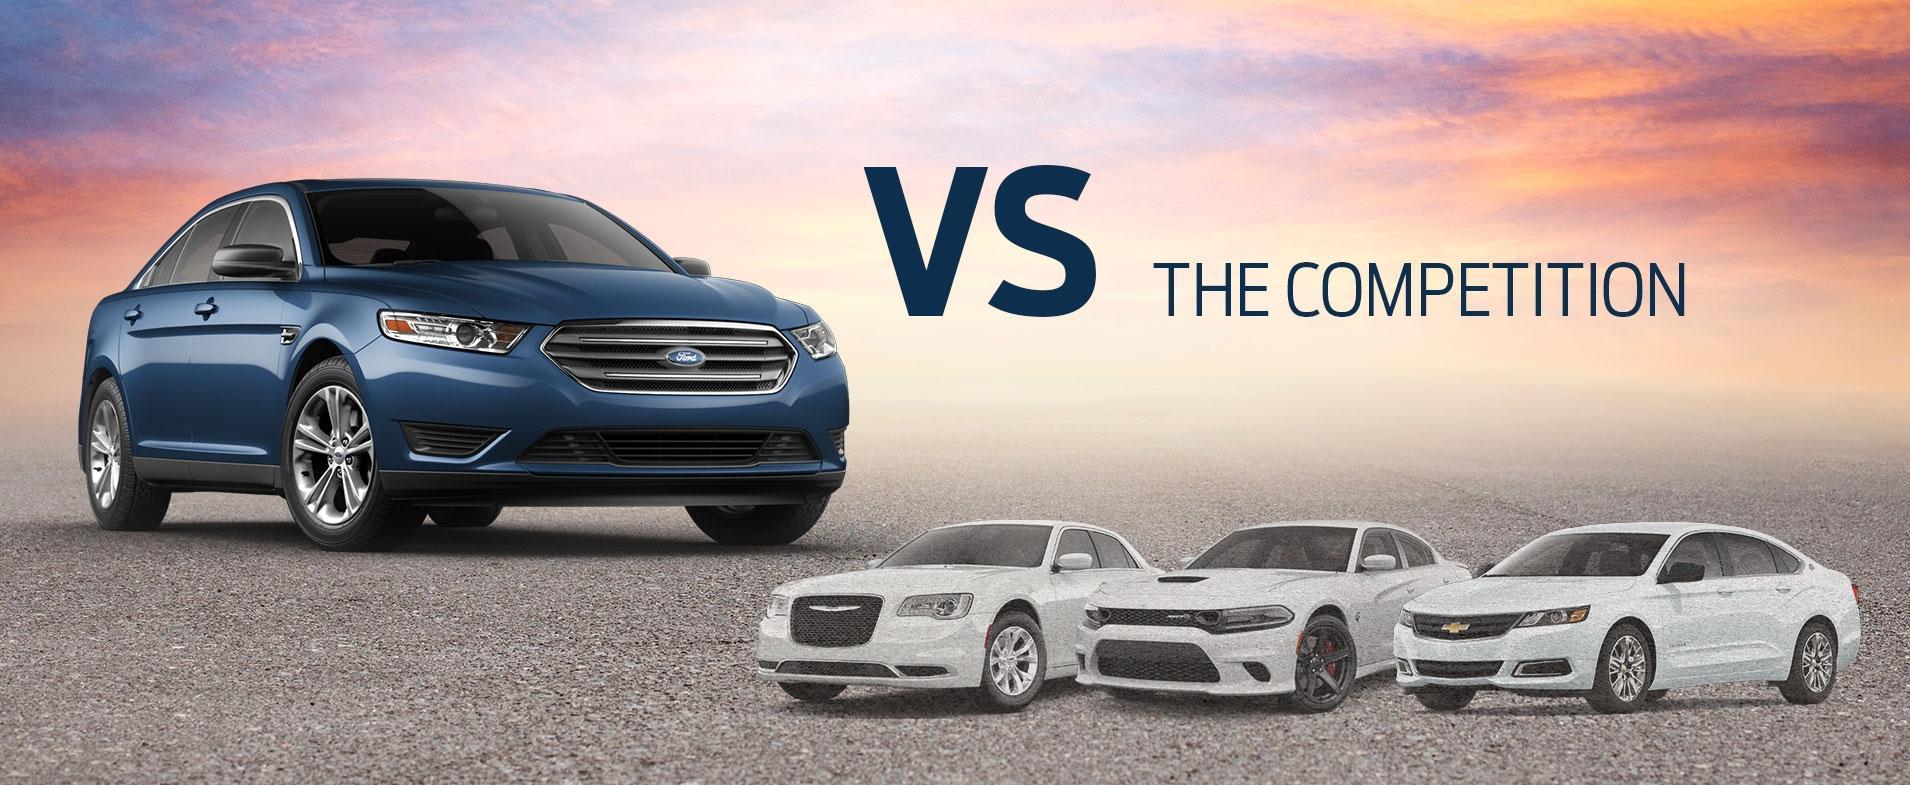 Taurus vs Competition